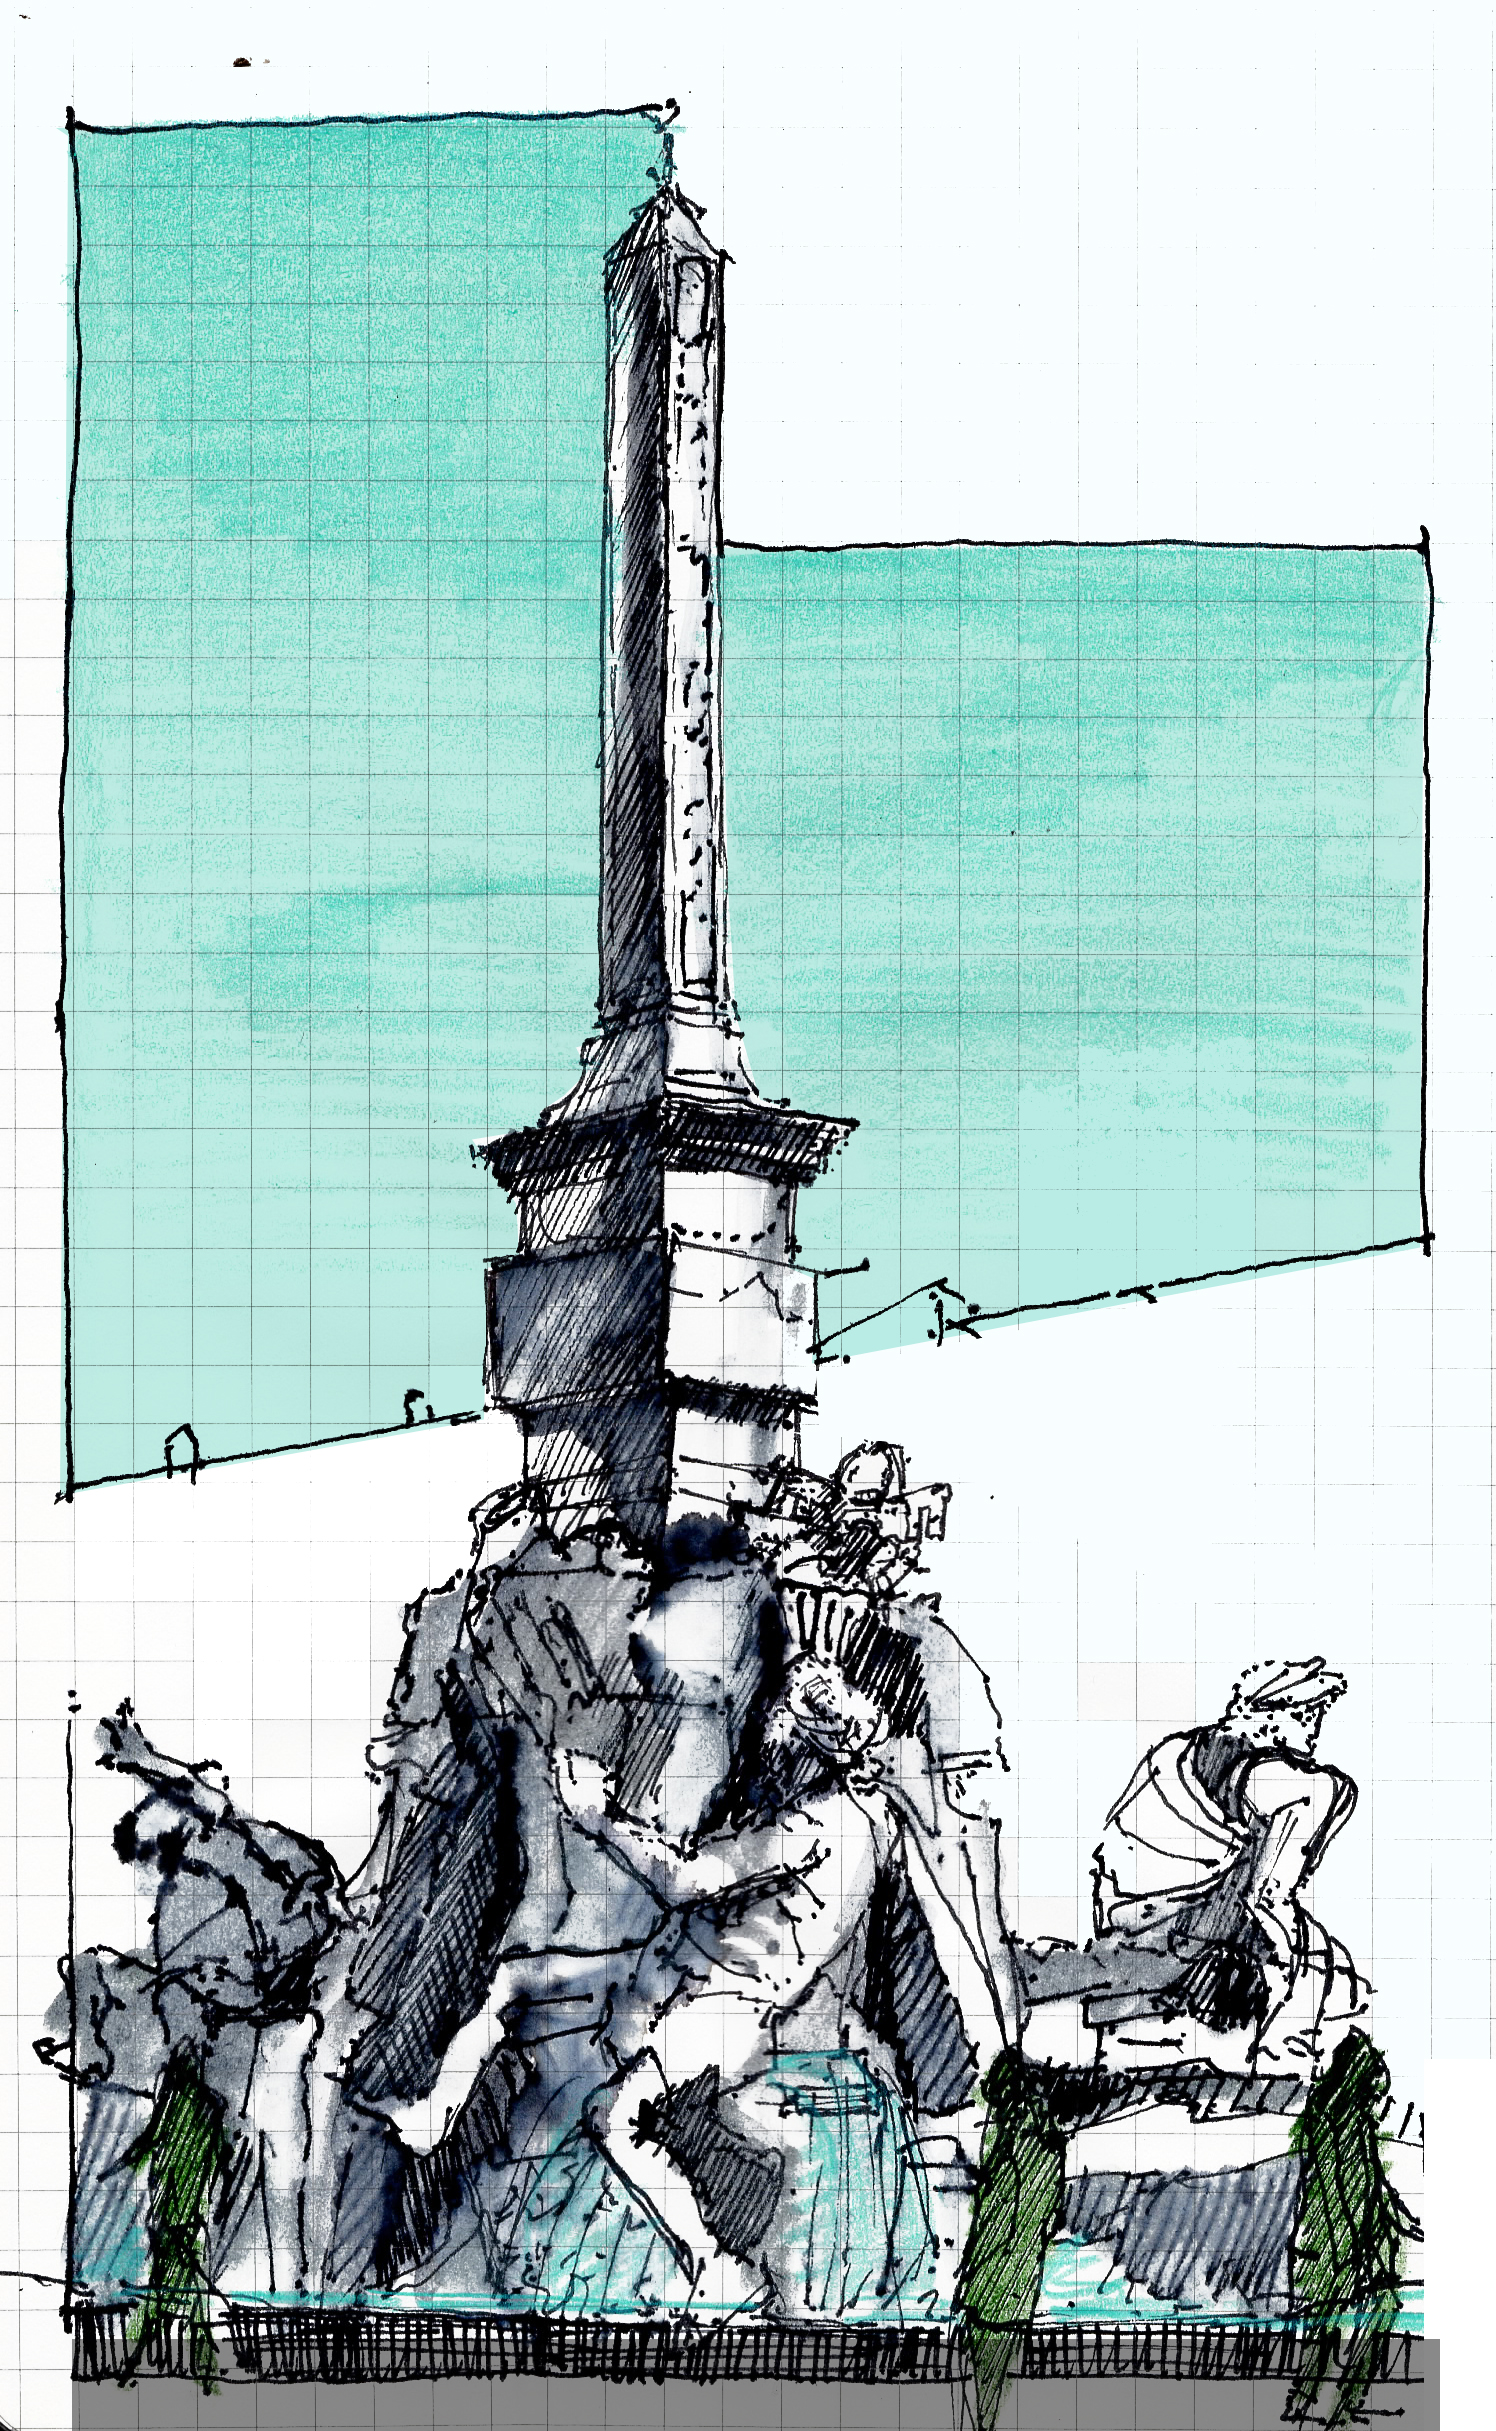 FountainSketch.jpg